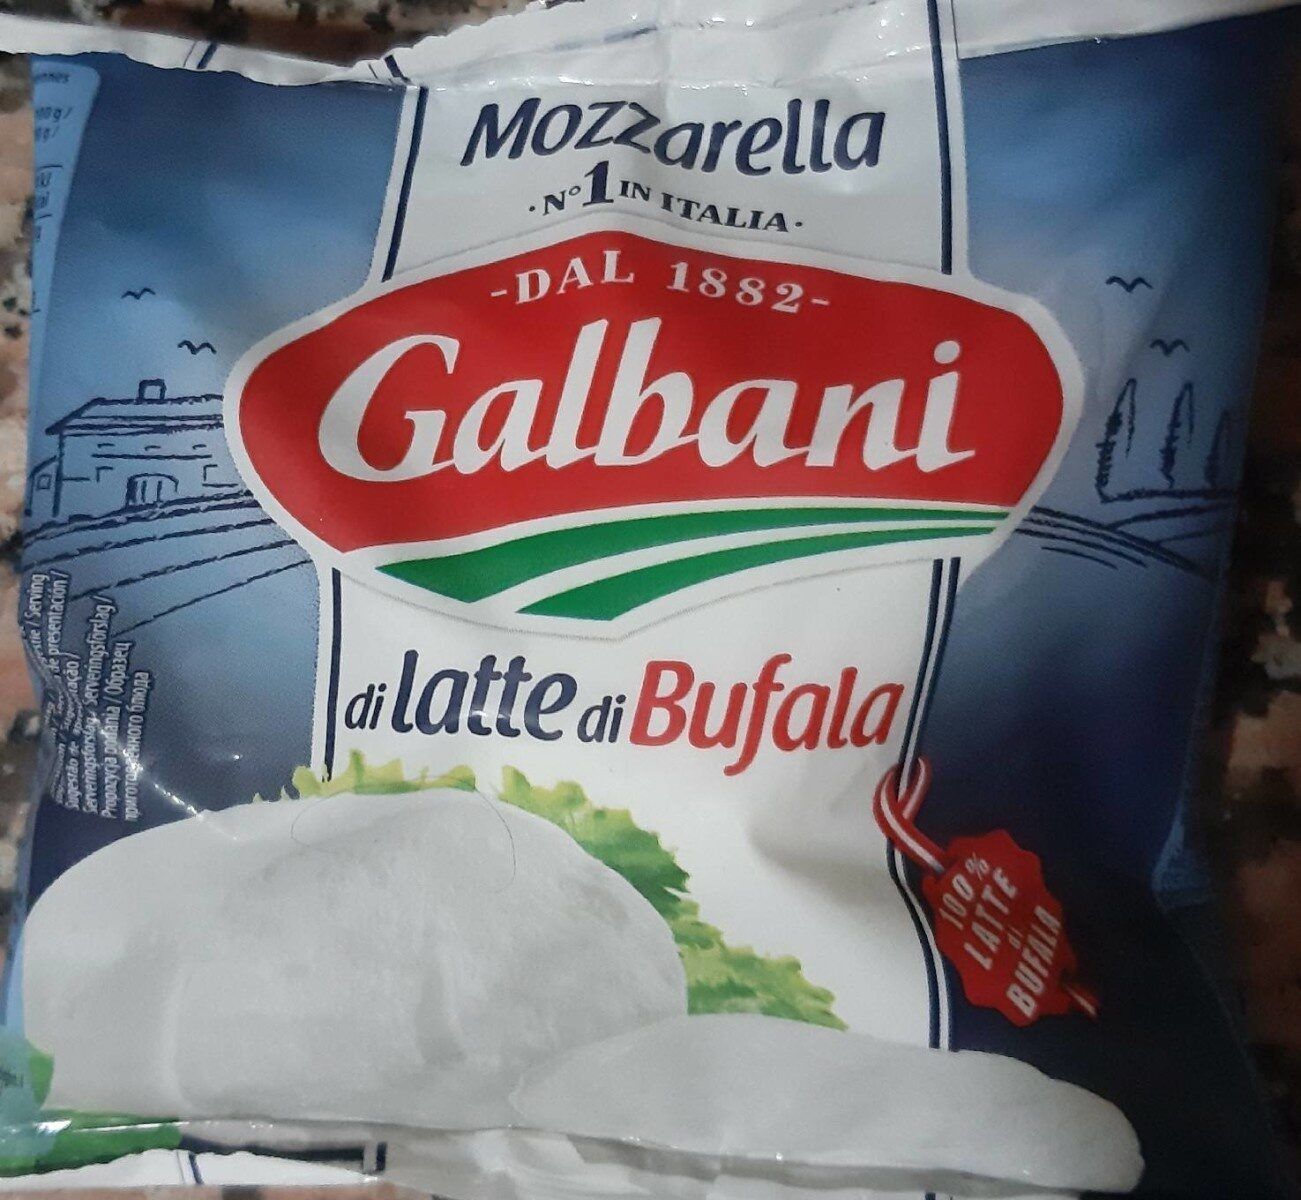 Mozzarella di Latte di Bufala - Produkt - en